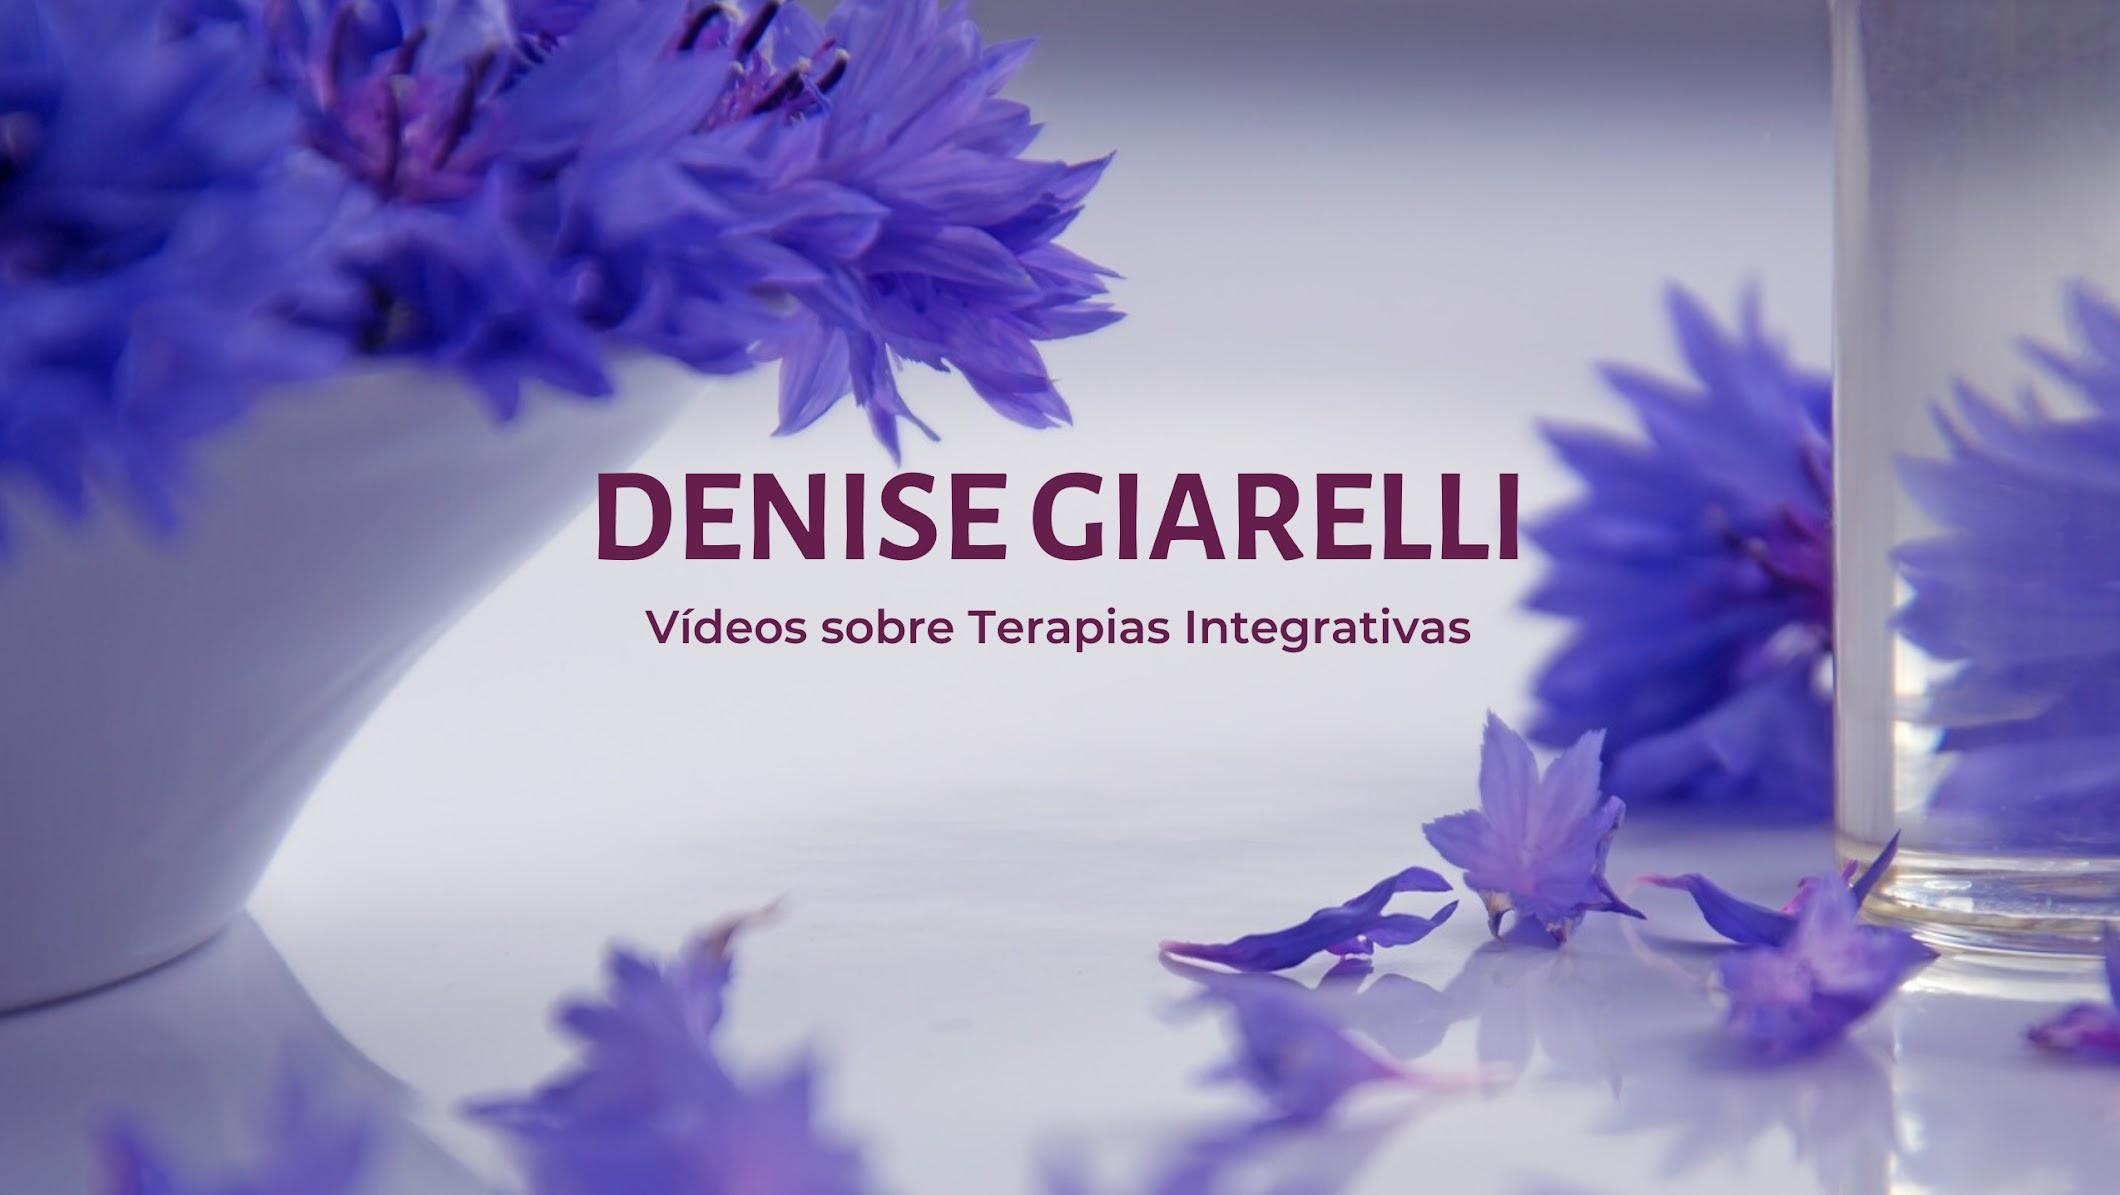 Denise Giarelli - Insights para vida